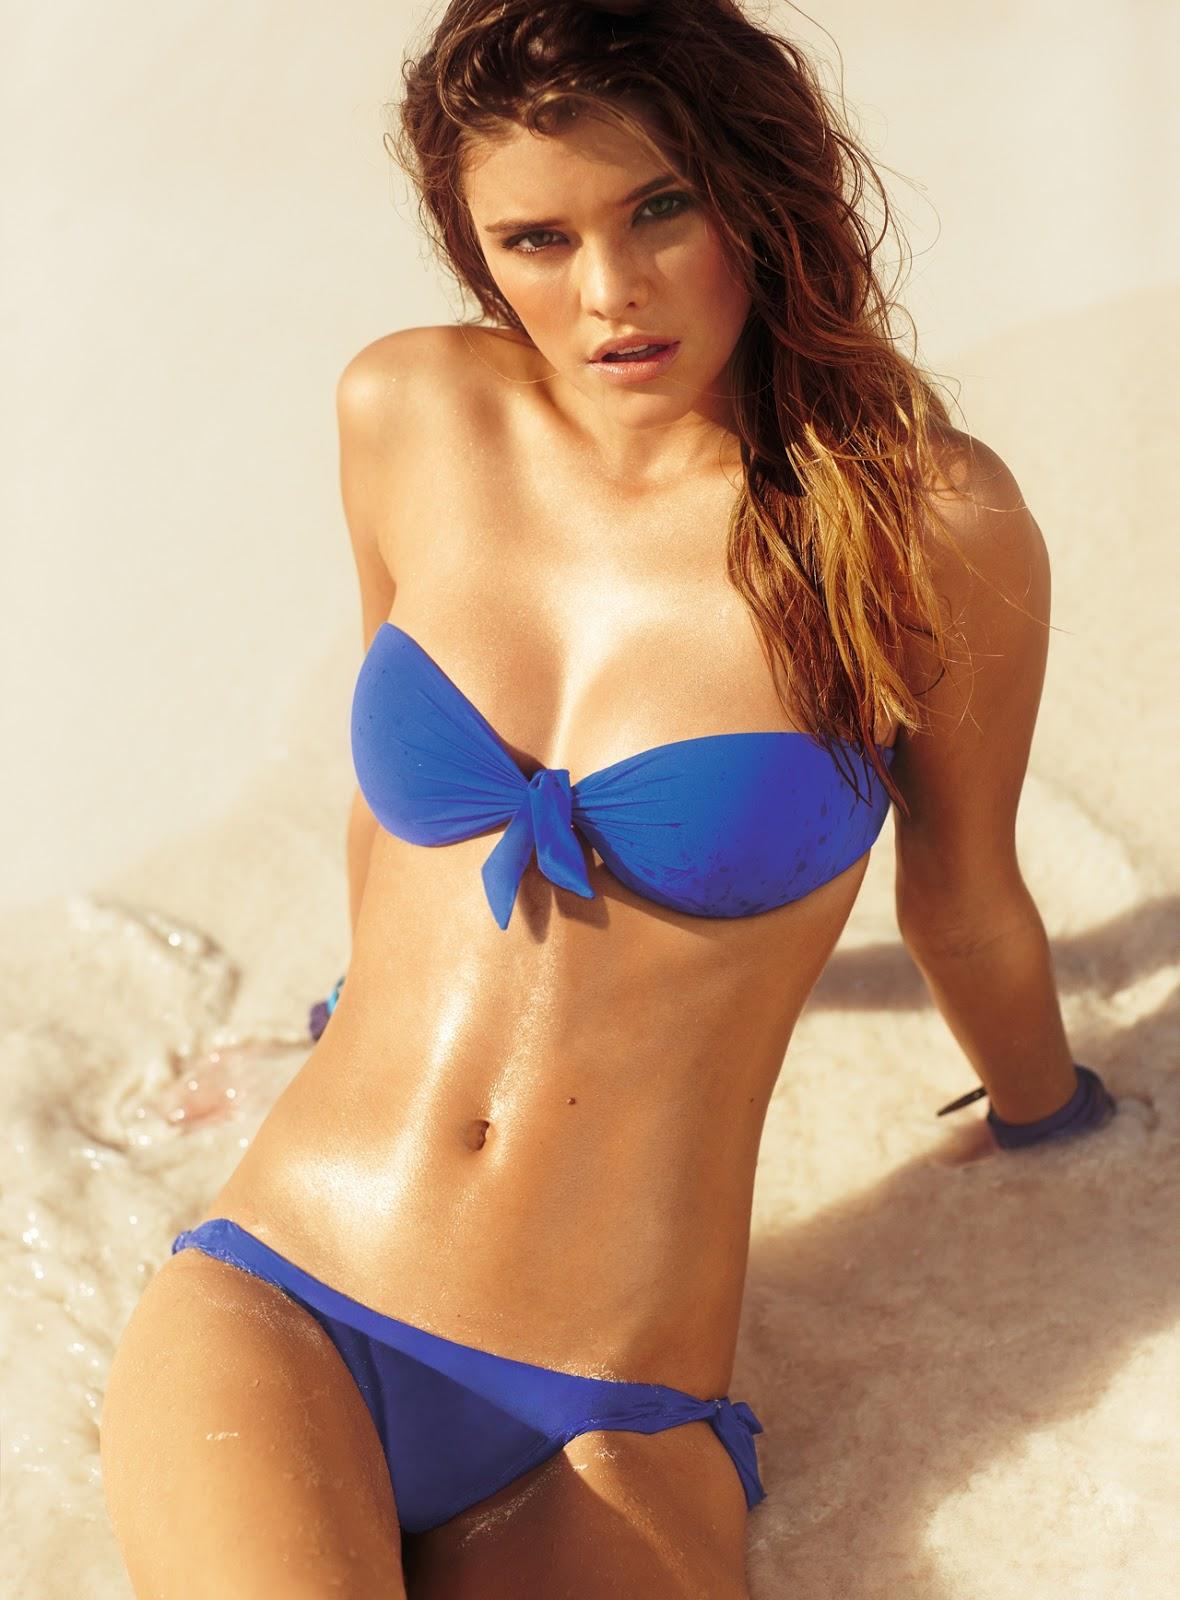 7b1aea4970955 Nina Agdal - Danish Model in Bikini